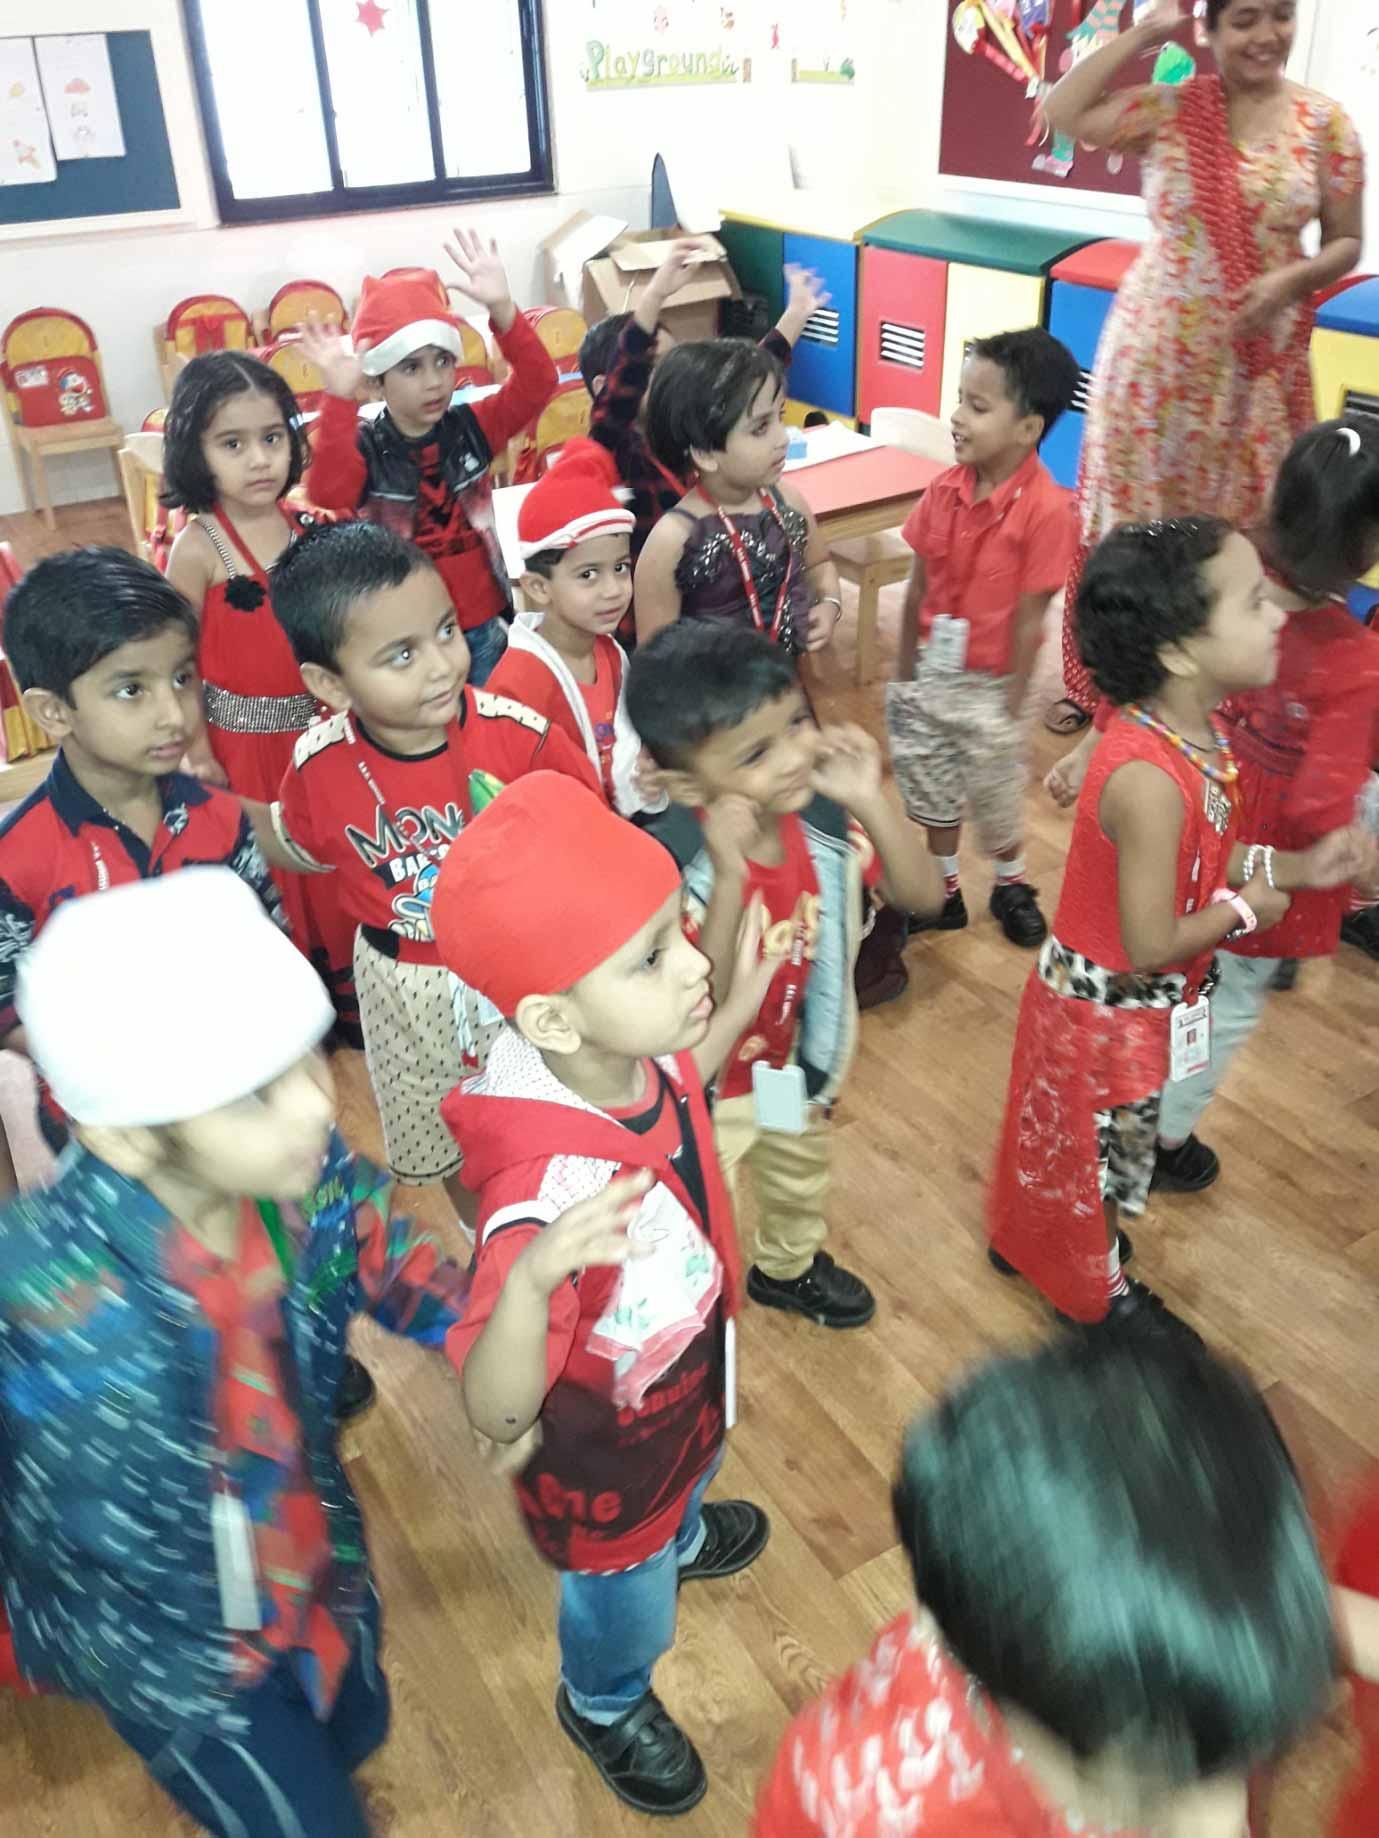 Students of VES DBC Nurserywearing the Christmas theme dress and celebrating Christmas.